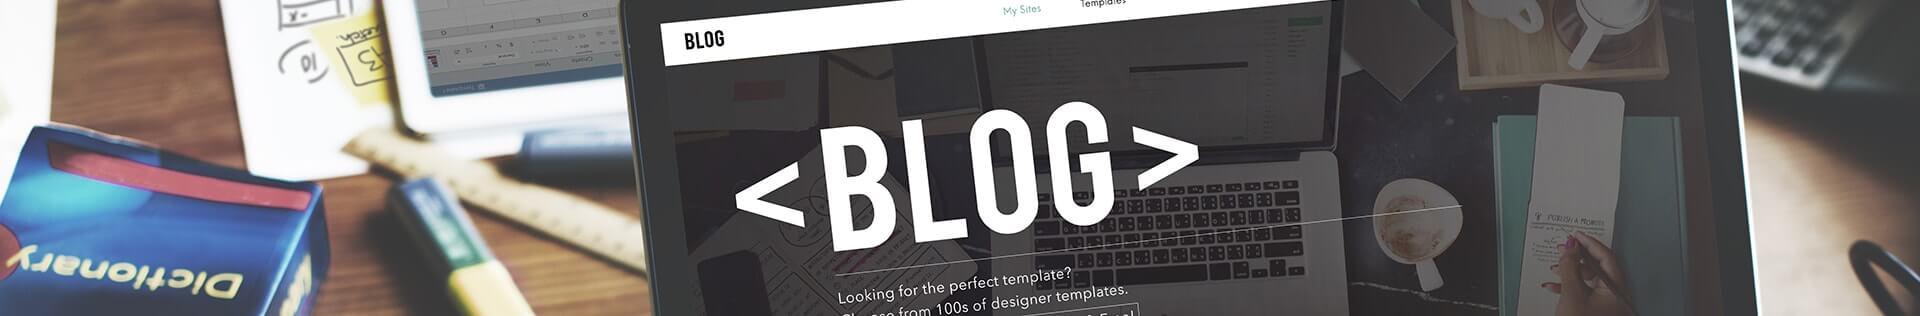 blog.jpg